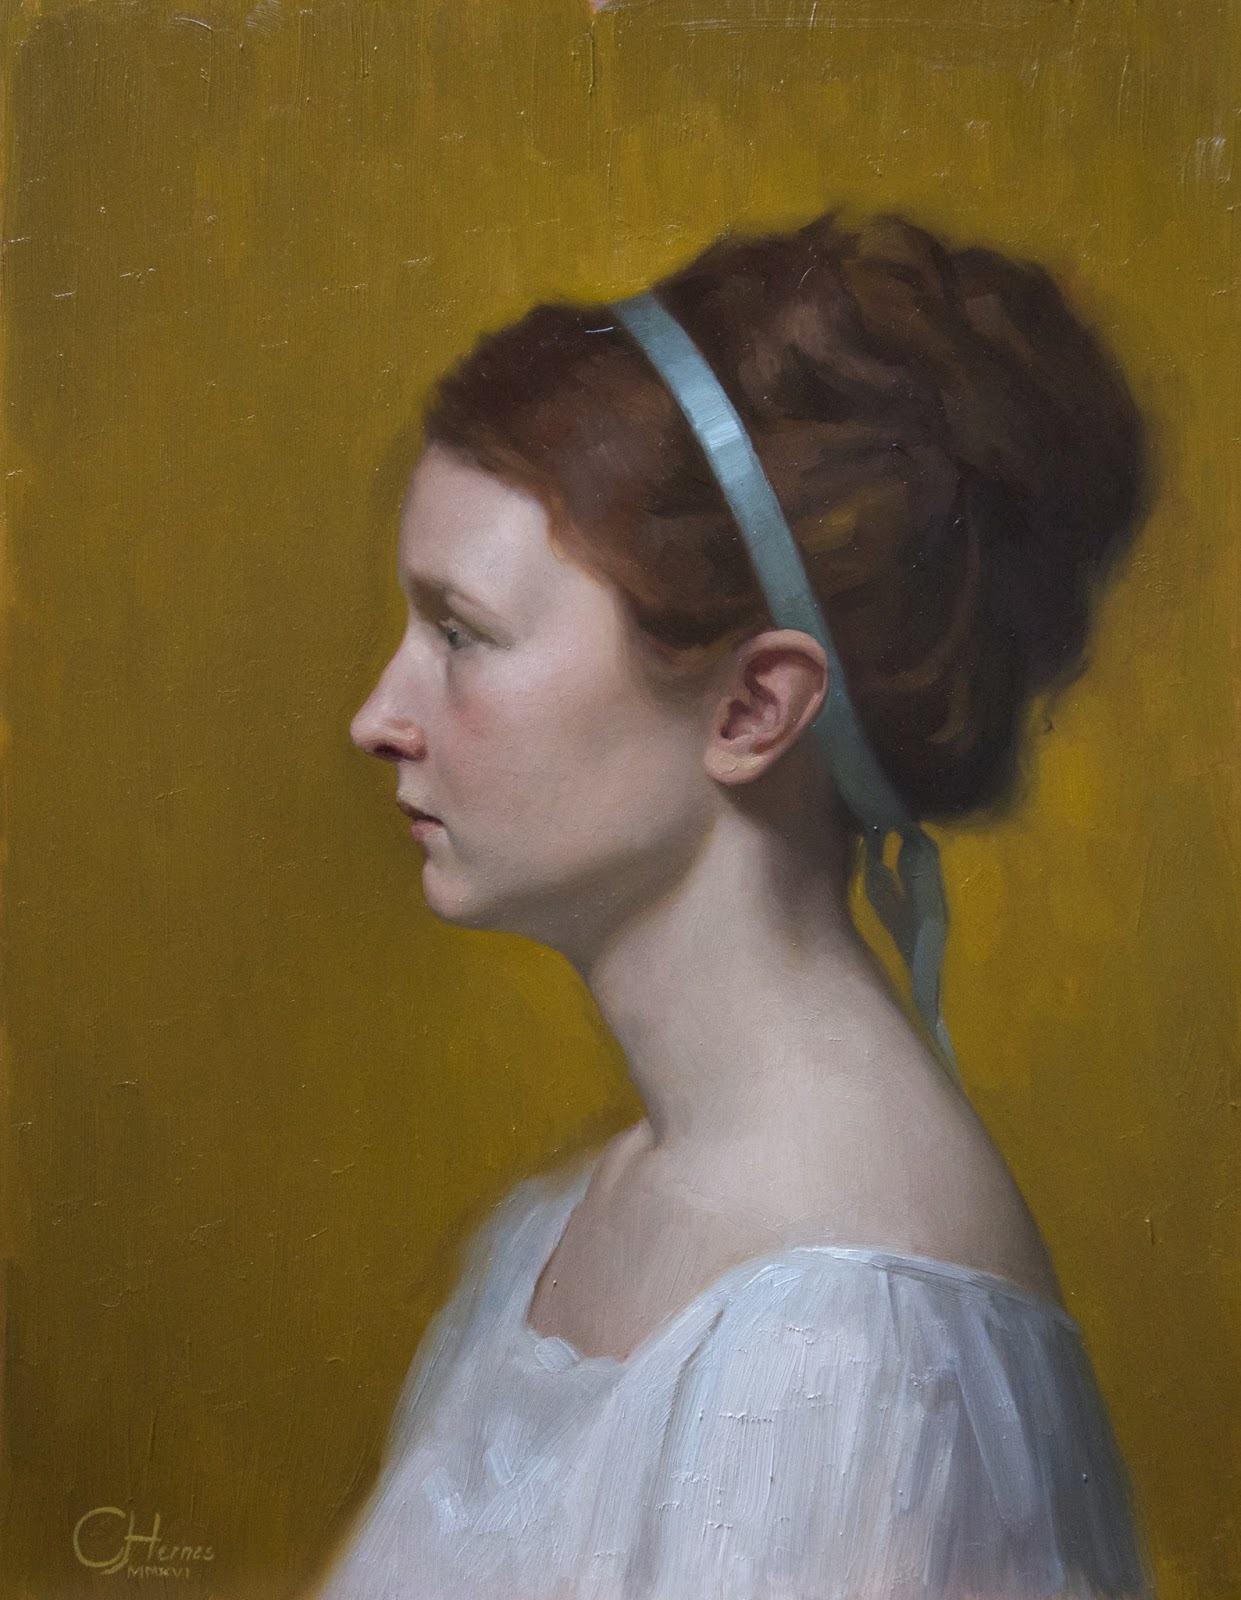 De Cornelia Hernes